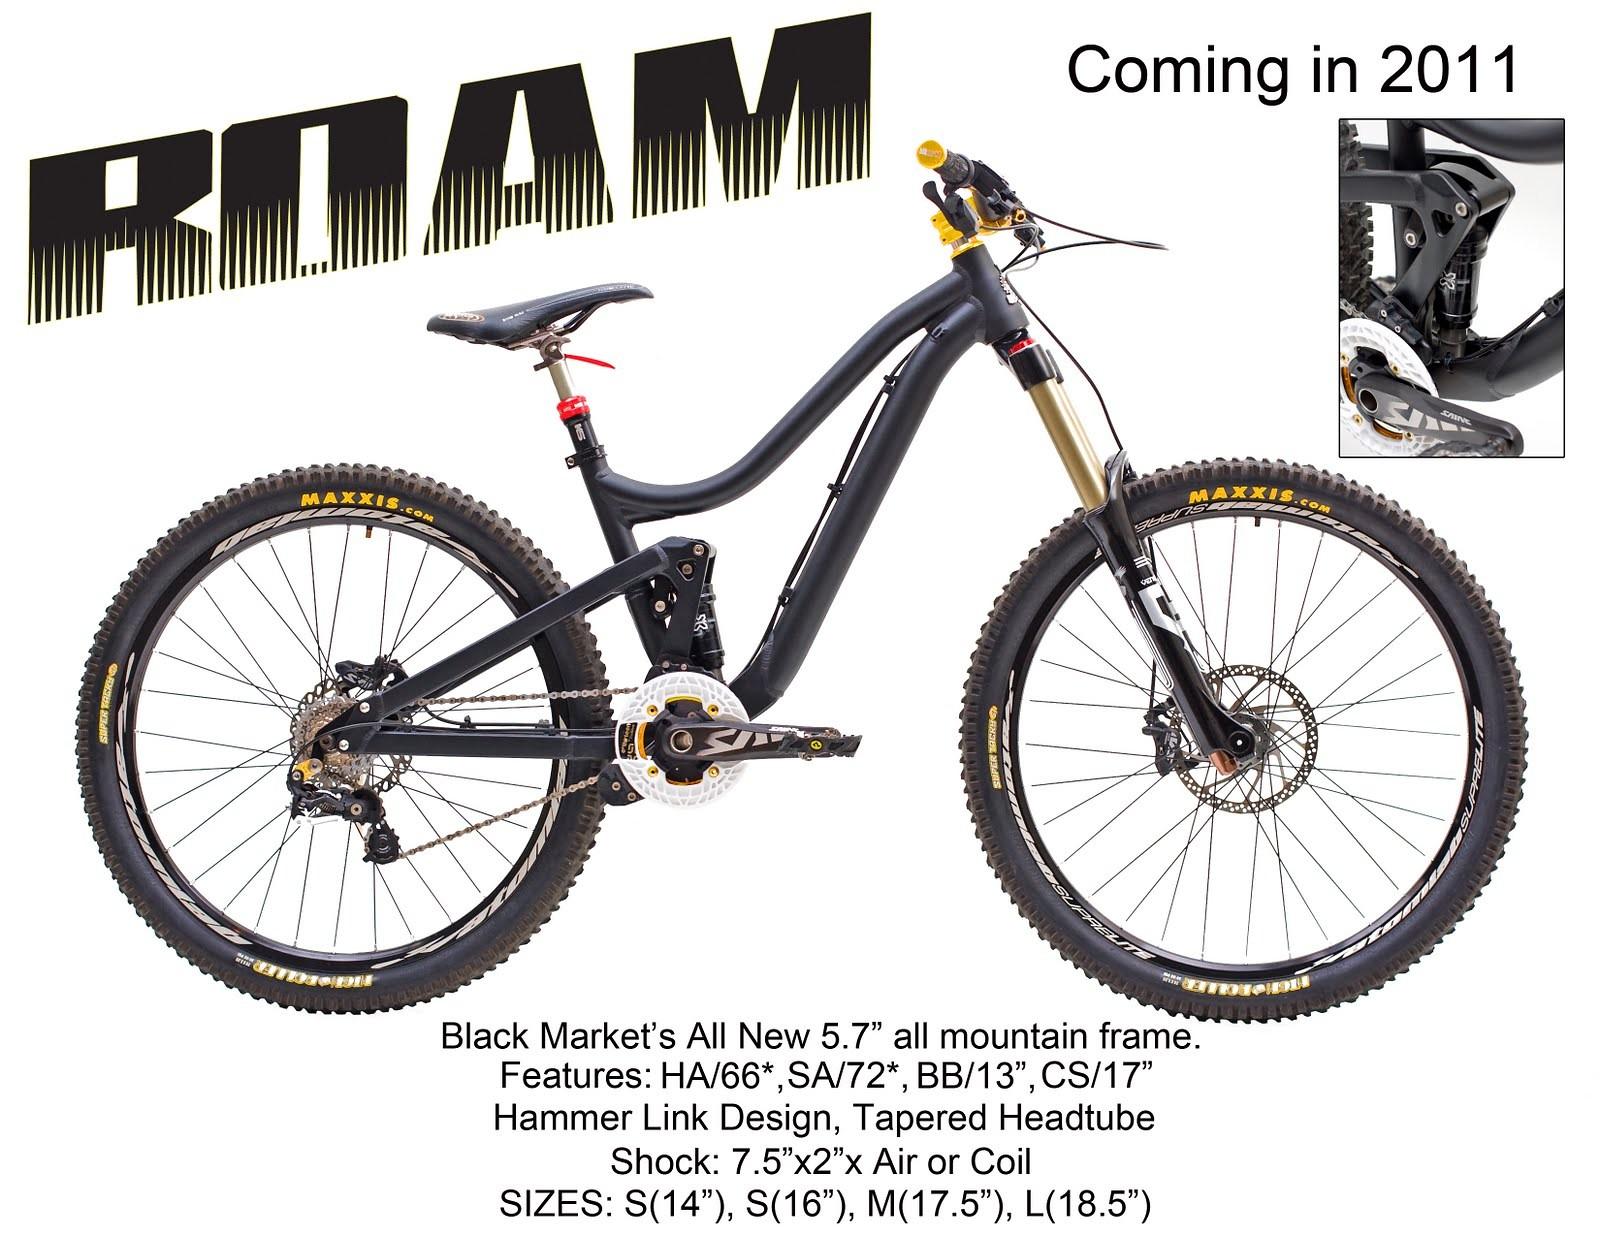 The Roam is Coming... - bturman - Mountain Biking Pictures - Vital MTB